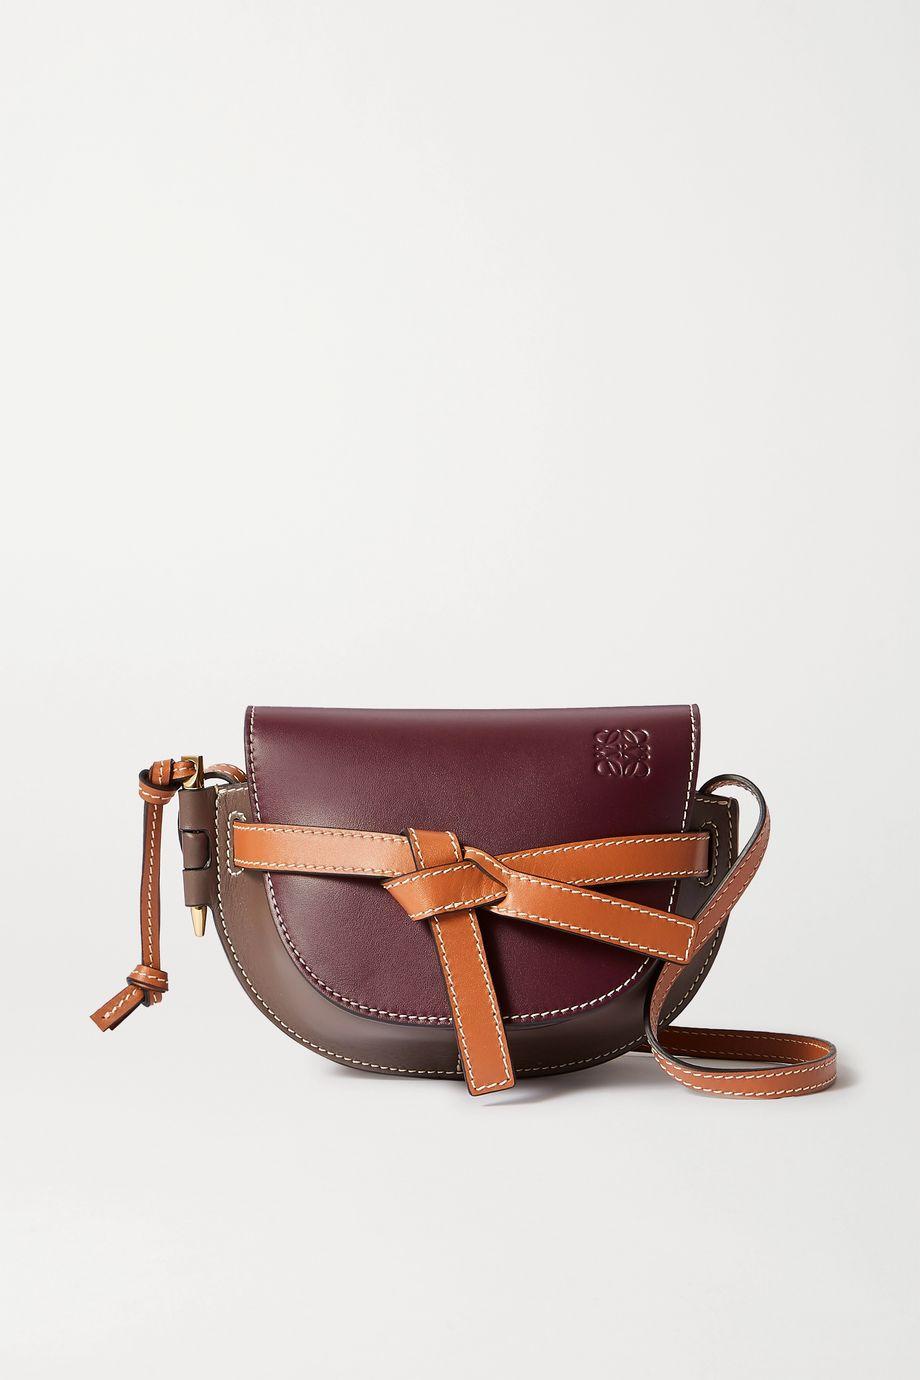 Loewe Gate mini color-block leather shoulder bag